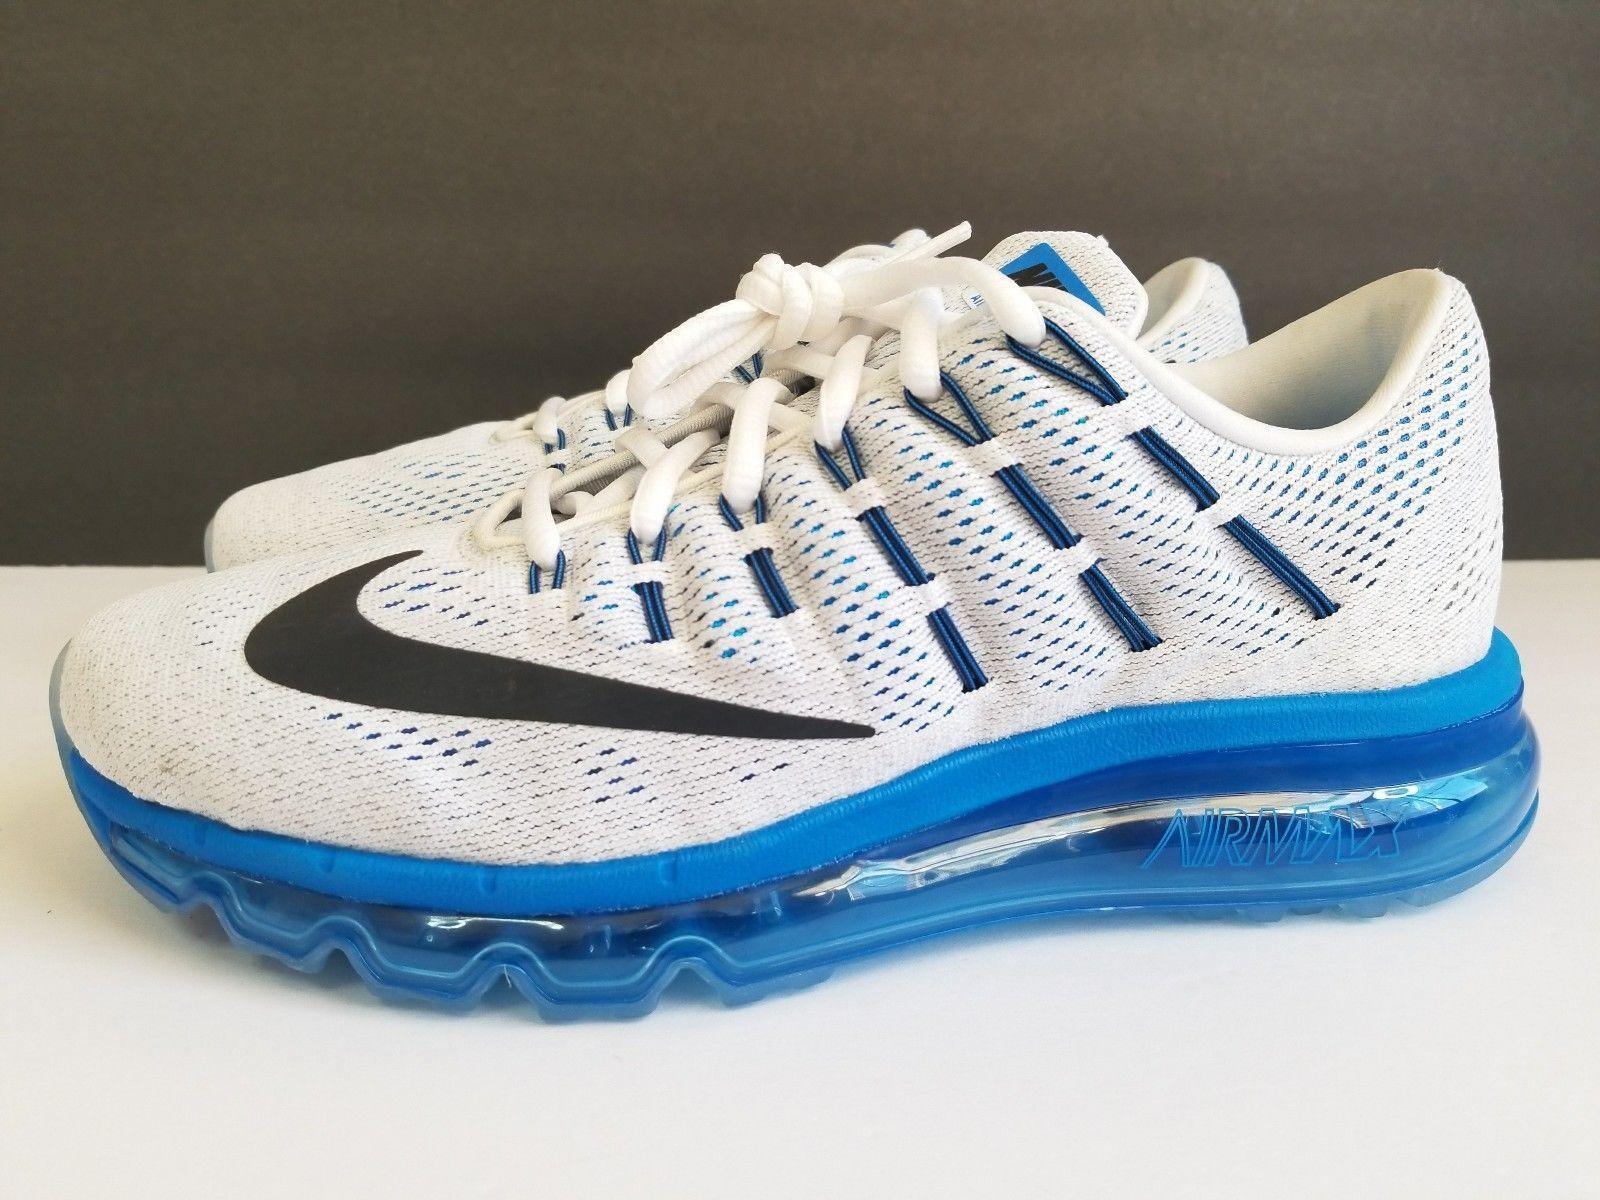 Nike Air Max 2016 Gs de Course Chaussure Blanc Bleu 807236-100 Sz 6.5Y / Femme 8